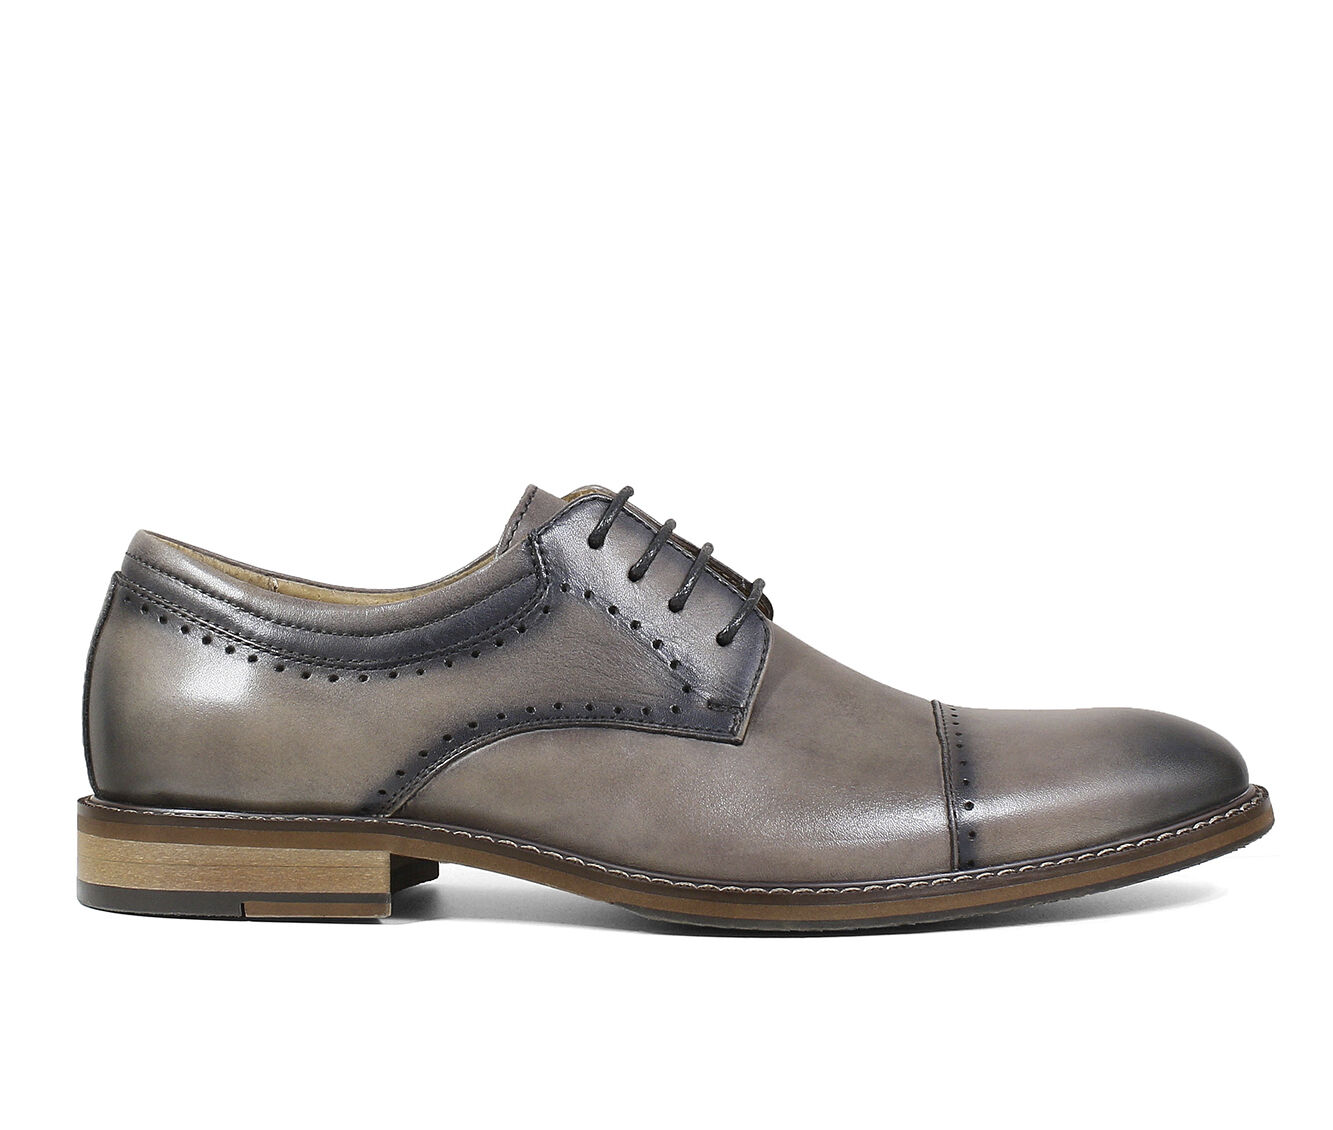 Men's Stacy Adams Flemming Dress Shoes Gray